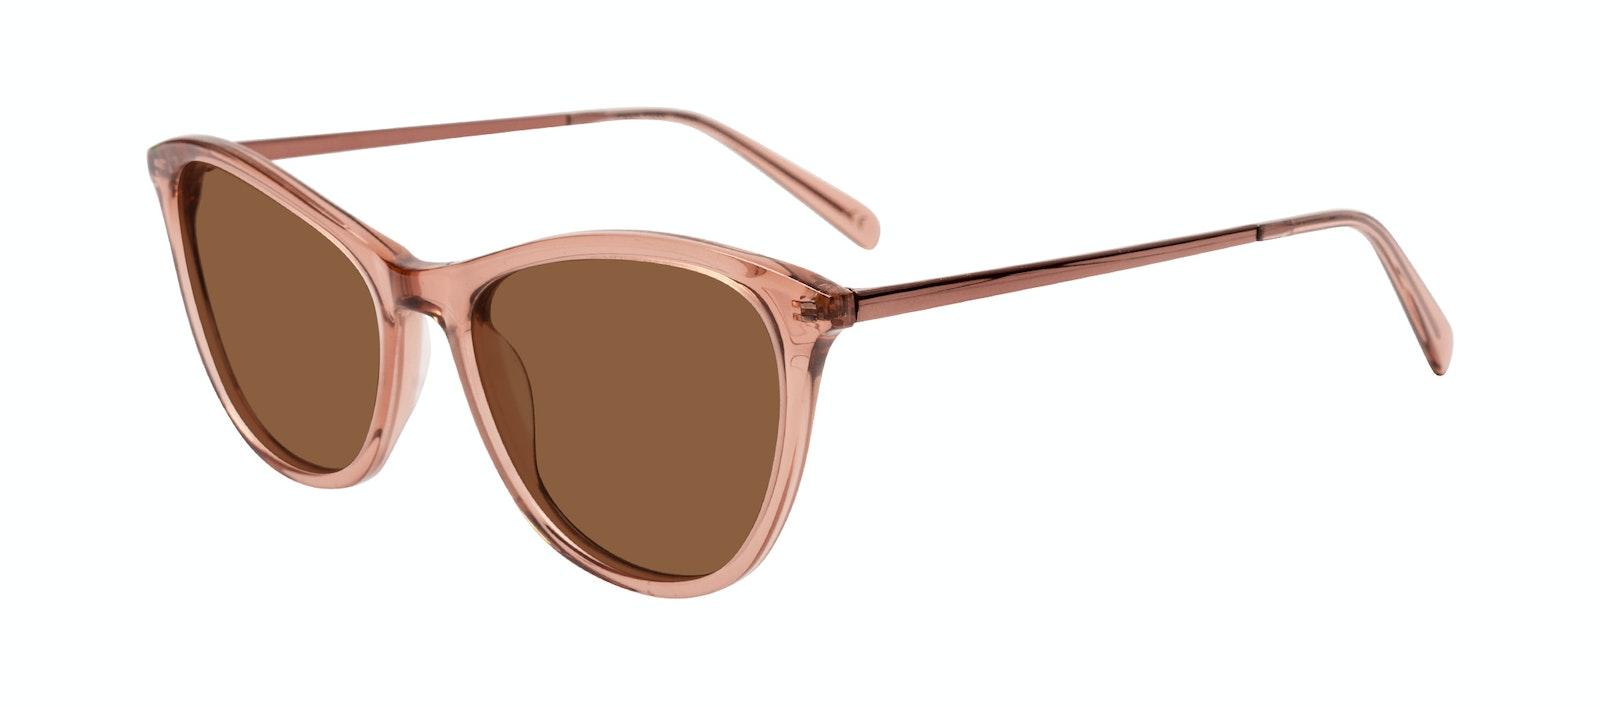 Affordable Fashion Glasses Rectangle Sunglasses Women Folk Plus Rose Tilt